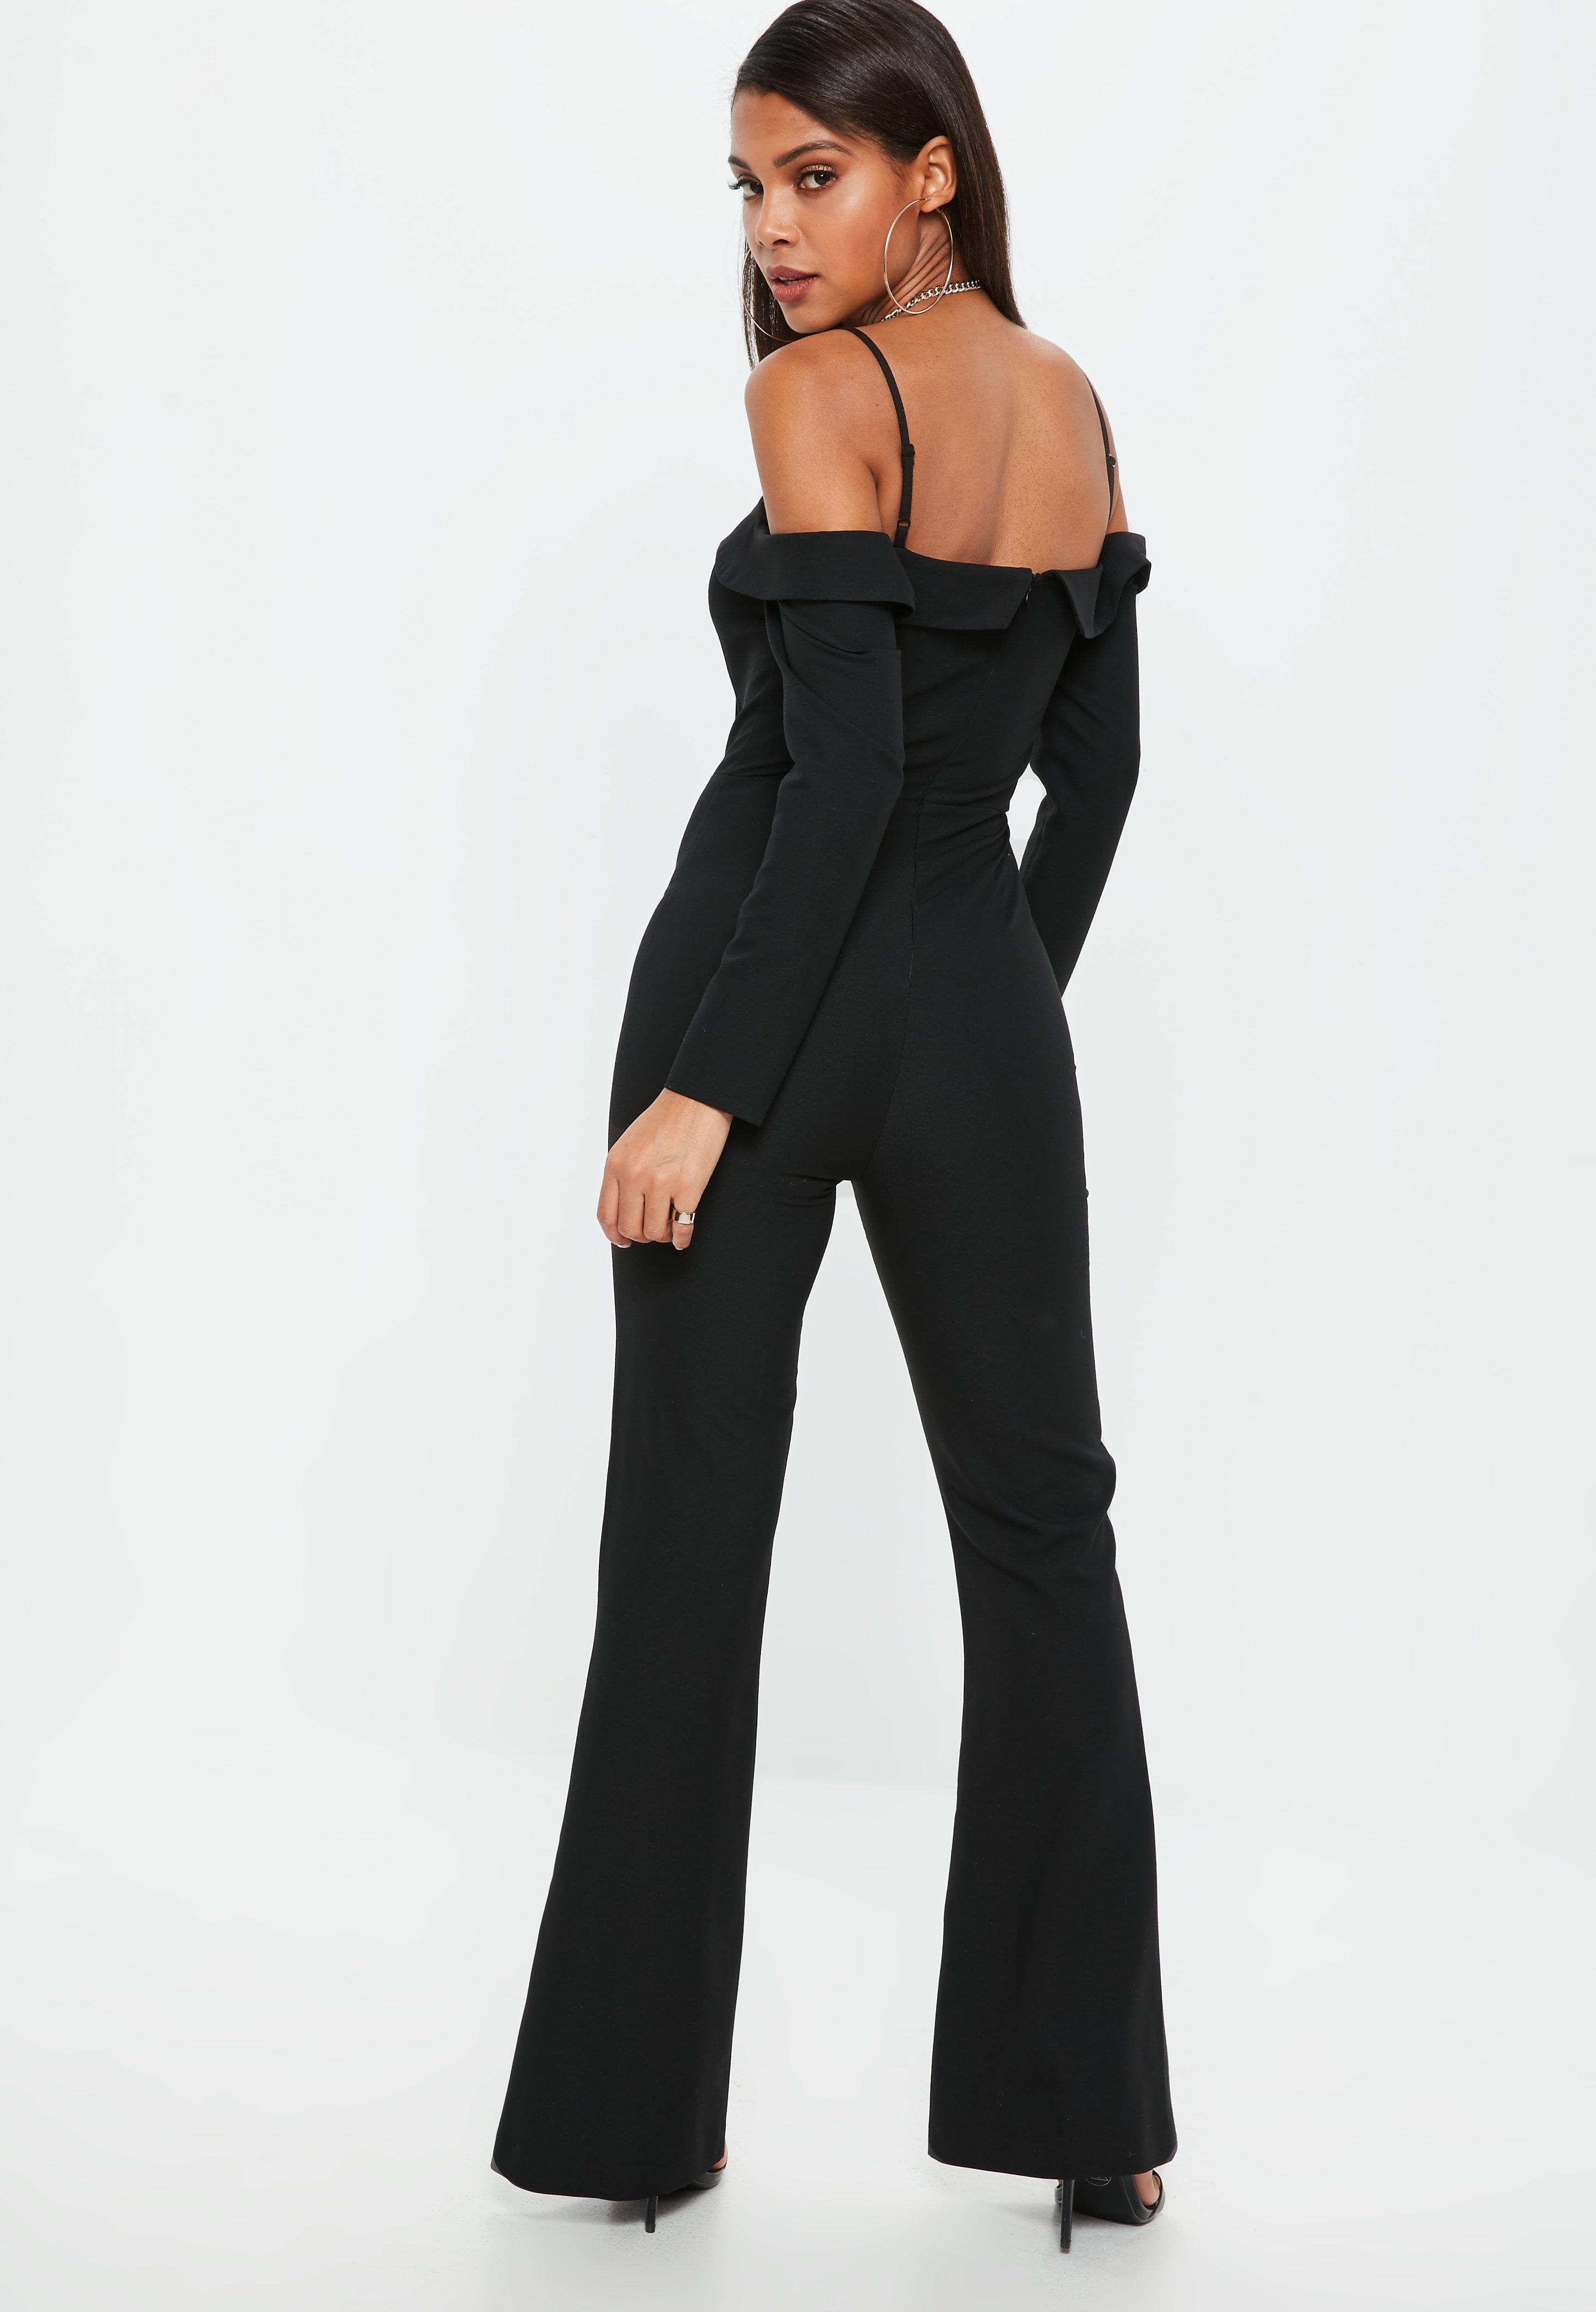 7d60ecc28b4 Lyst - Missguided Black Bardot Tux Long Sleeve Jumpsuit in Black